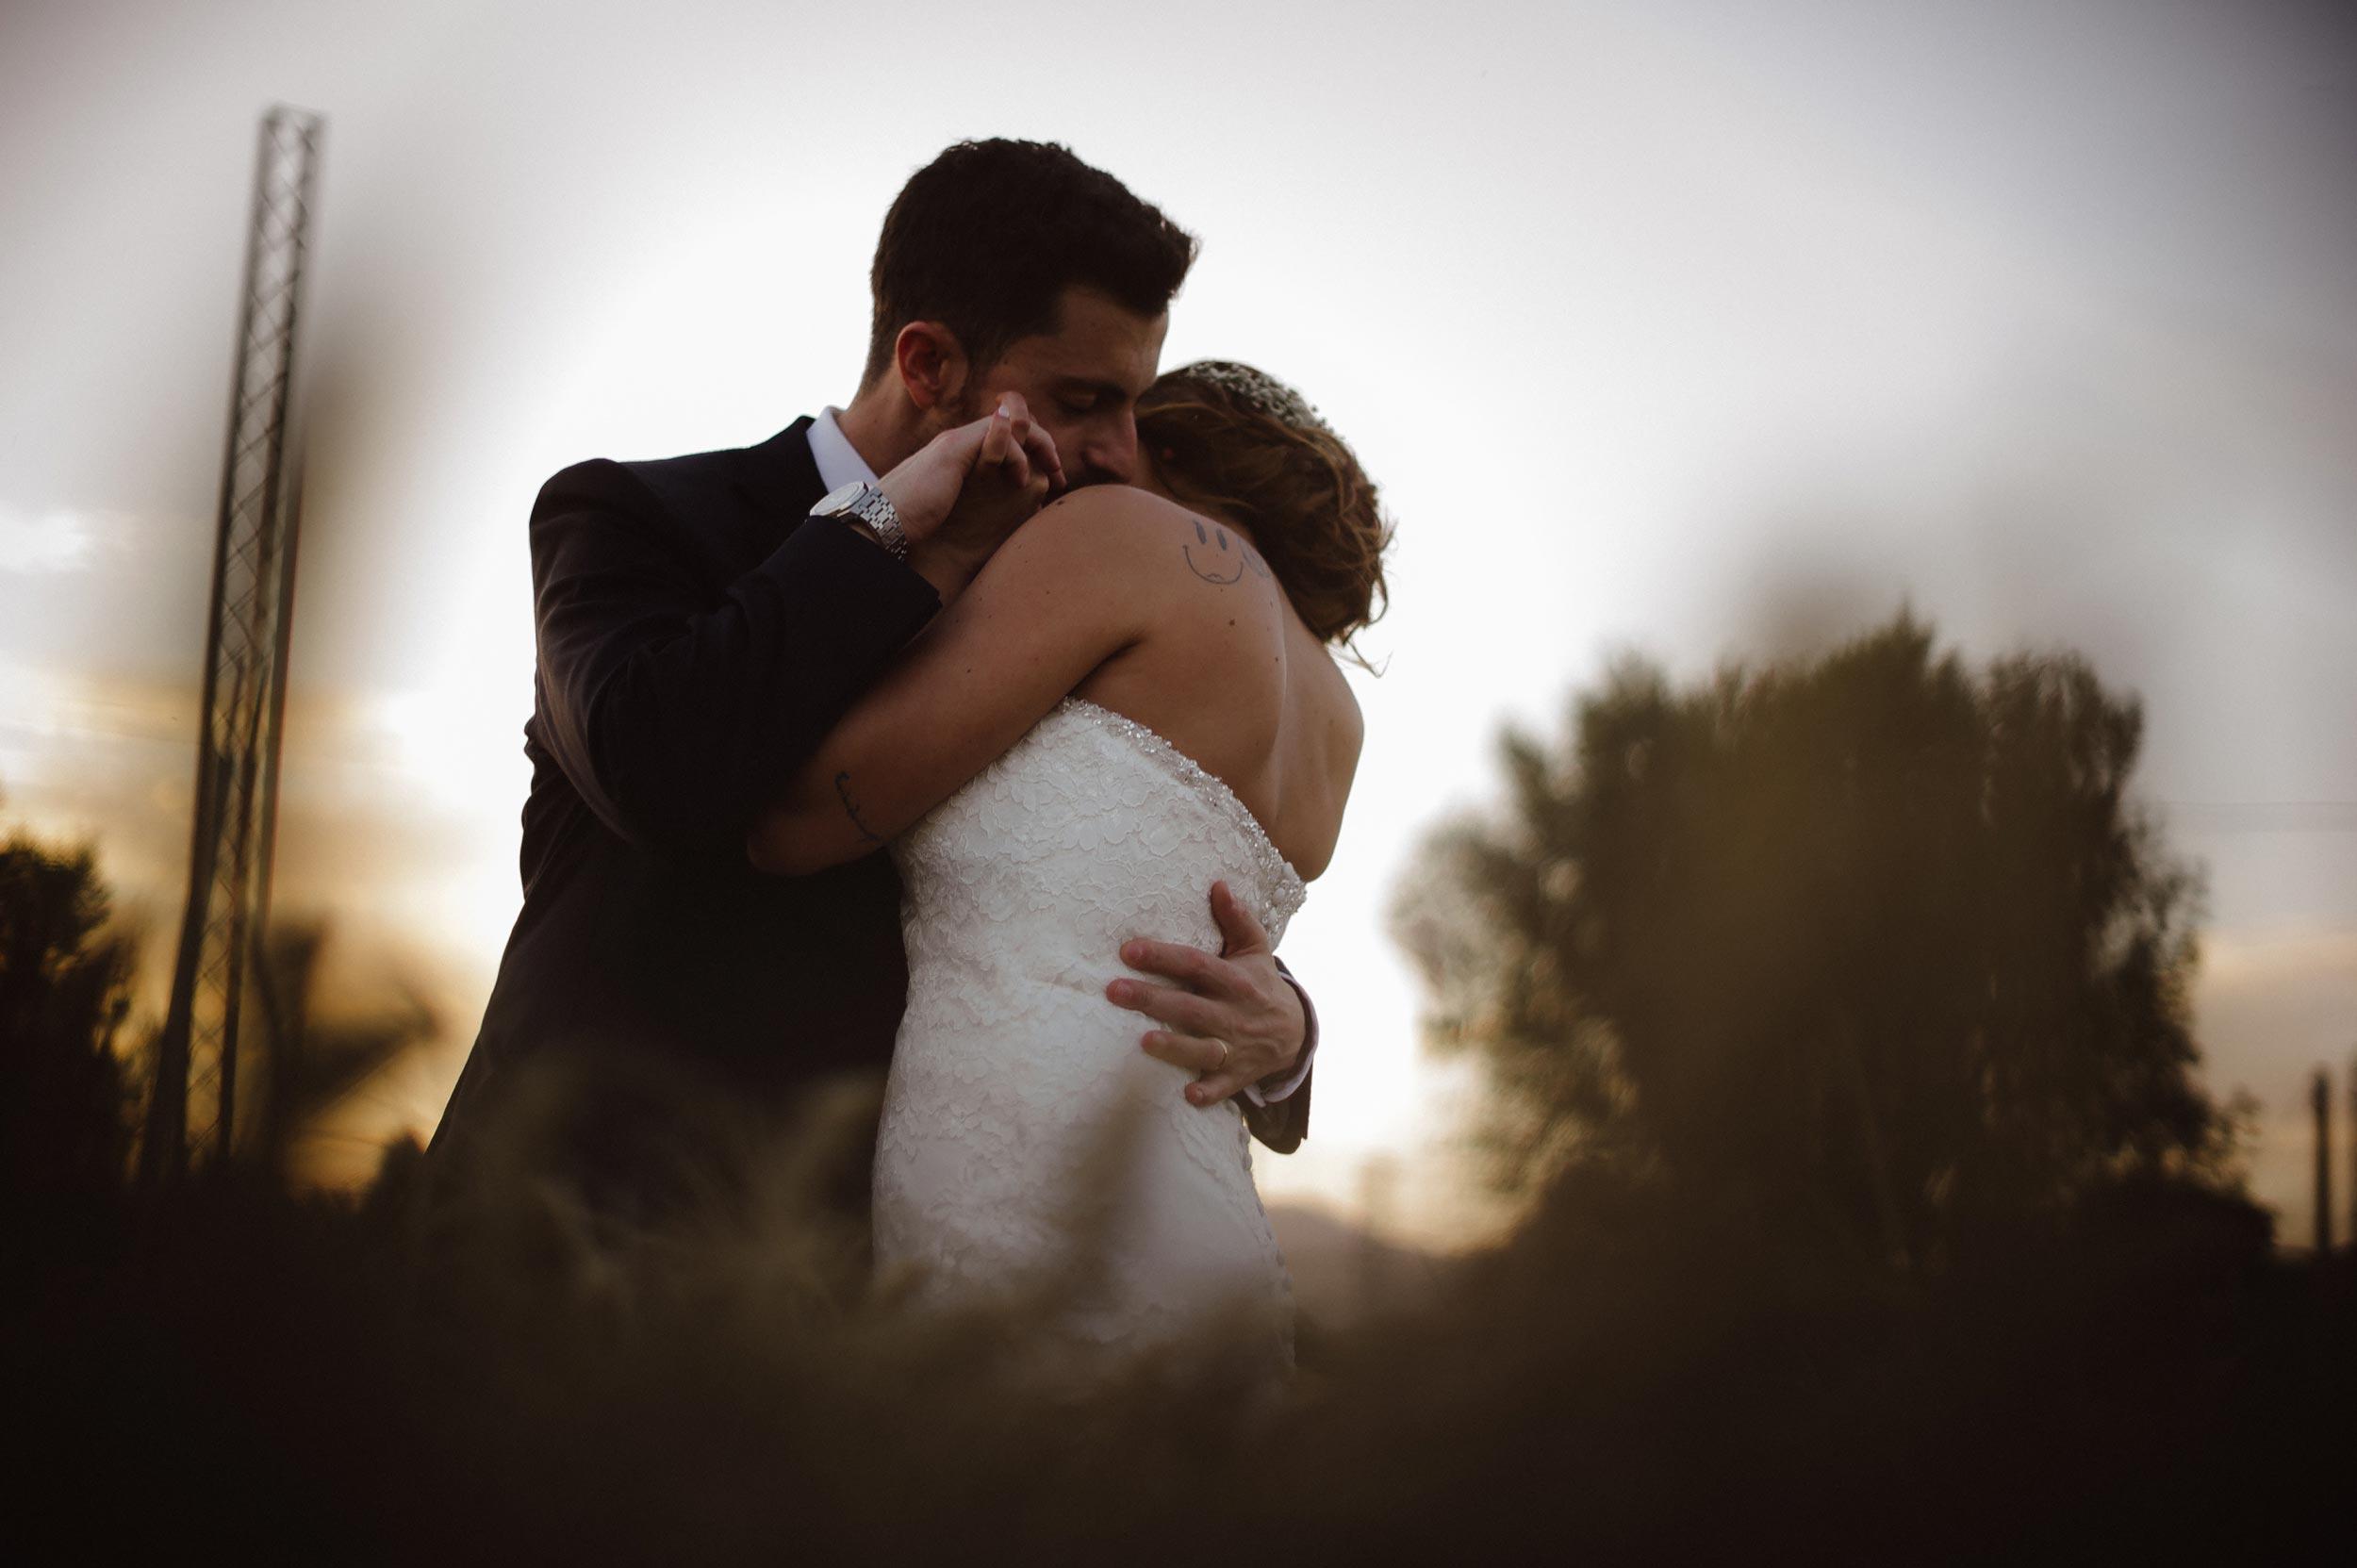 2016-Claudio-Teresa-Naples-Wedding-Photographer-Italy-Alessandro-Avenali-84.jpg